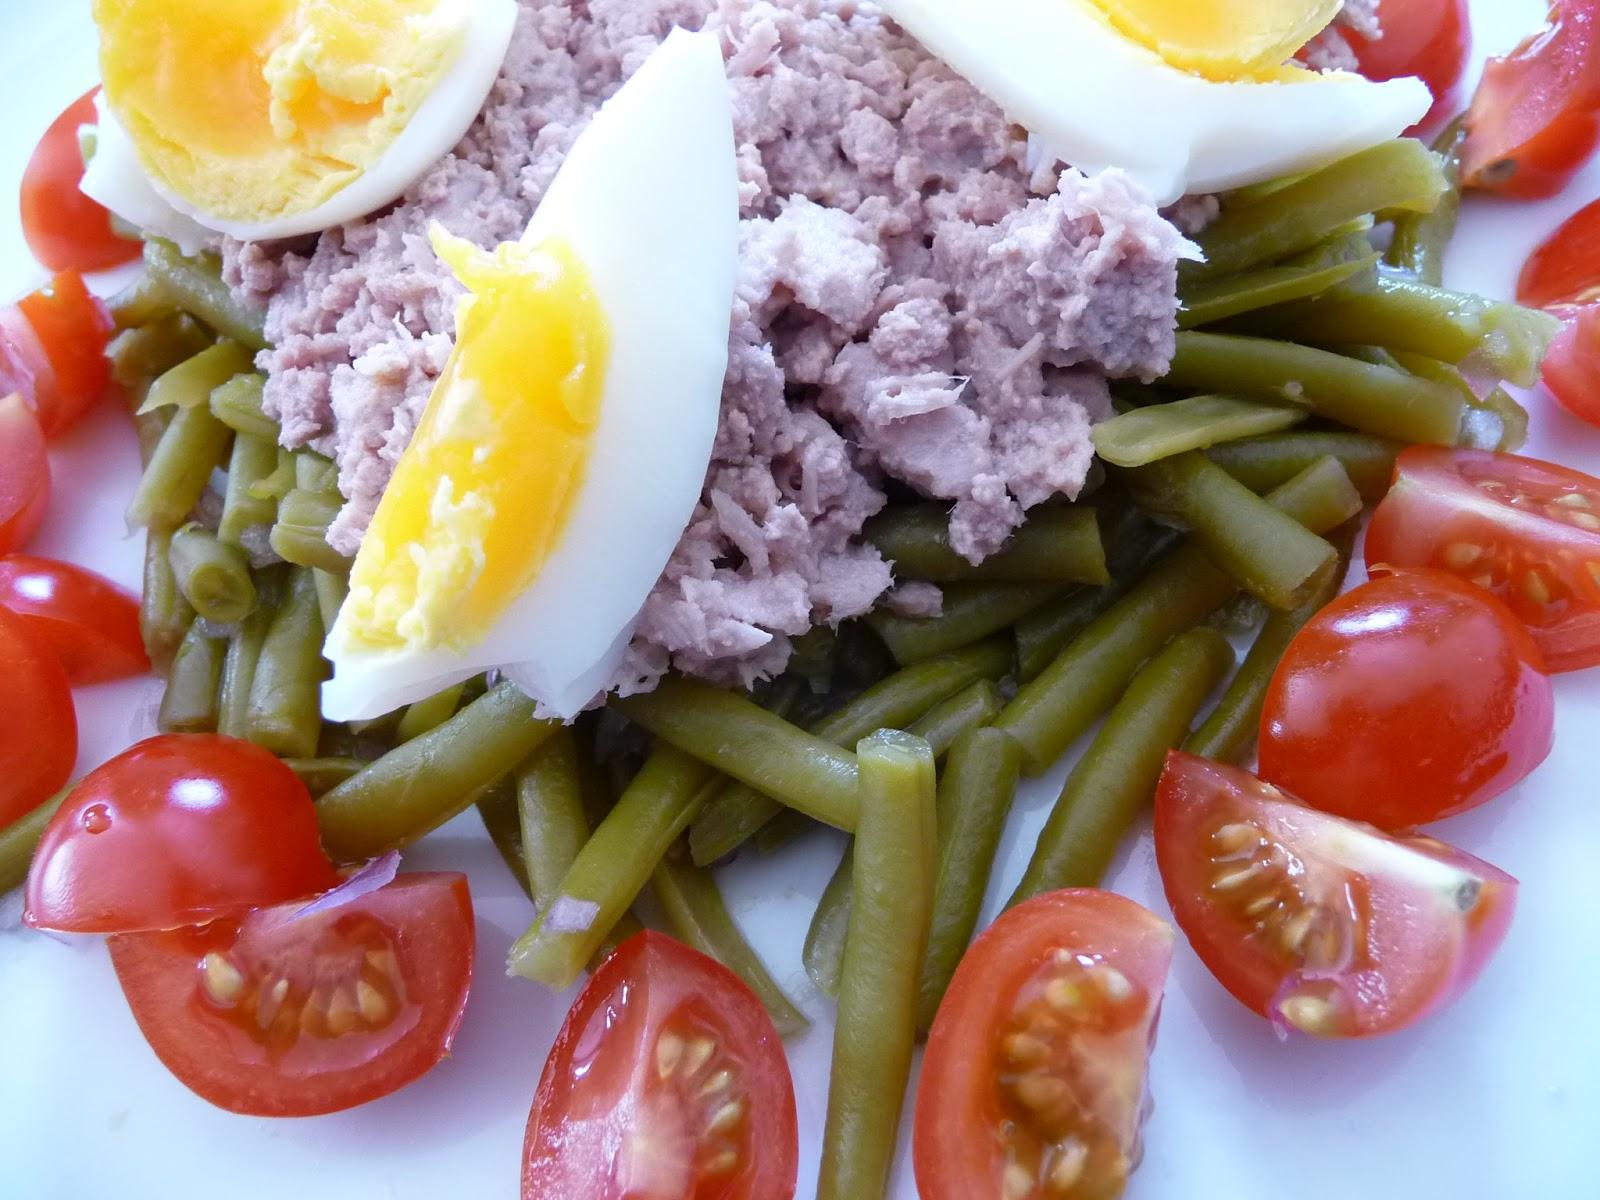 salade haricots verts tomates oeufs thon blogs de cuisine. Black Bedroom Furniture Sets. Home Design Ideas